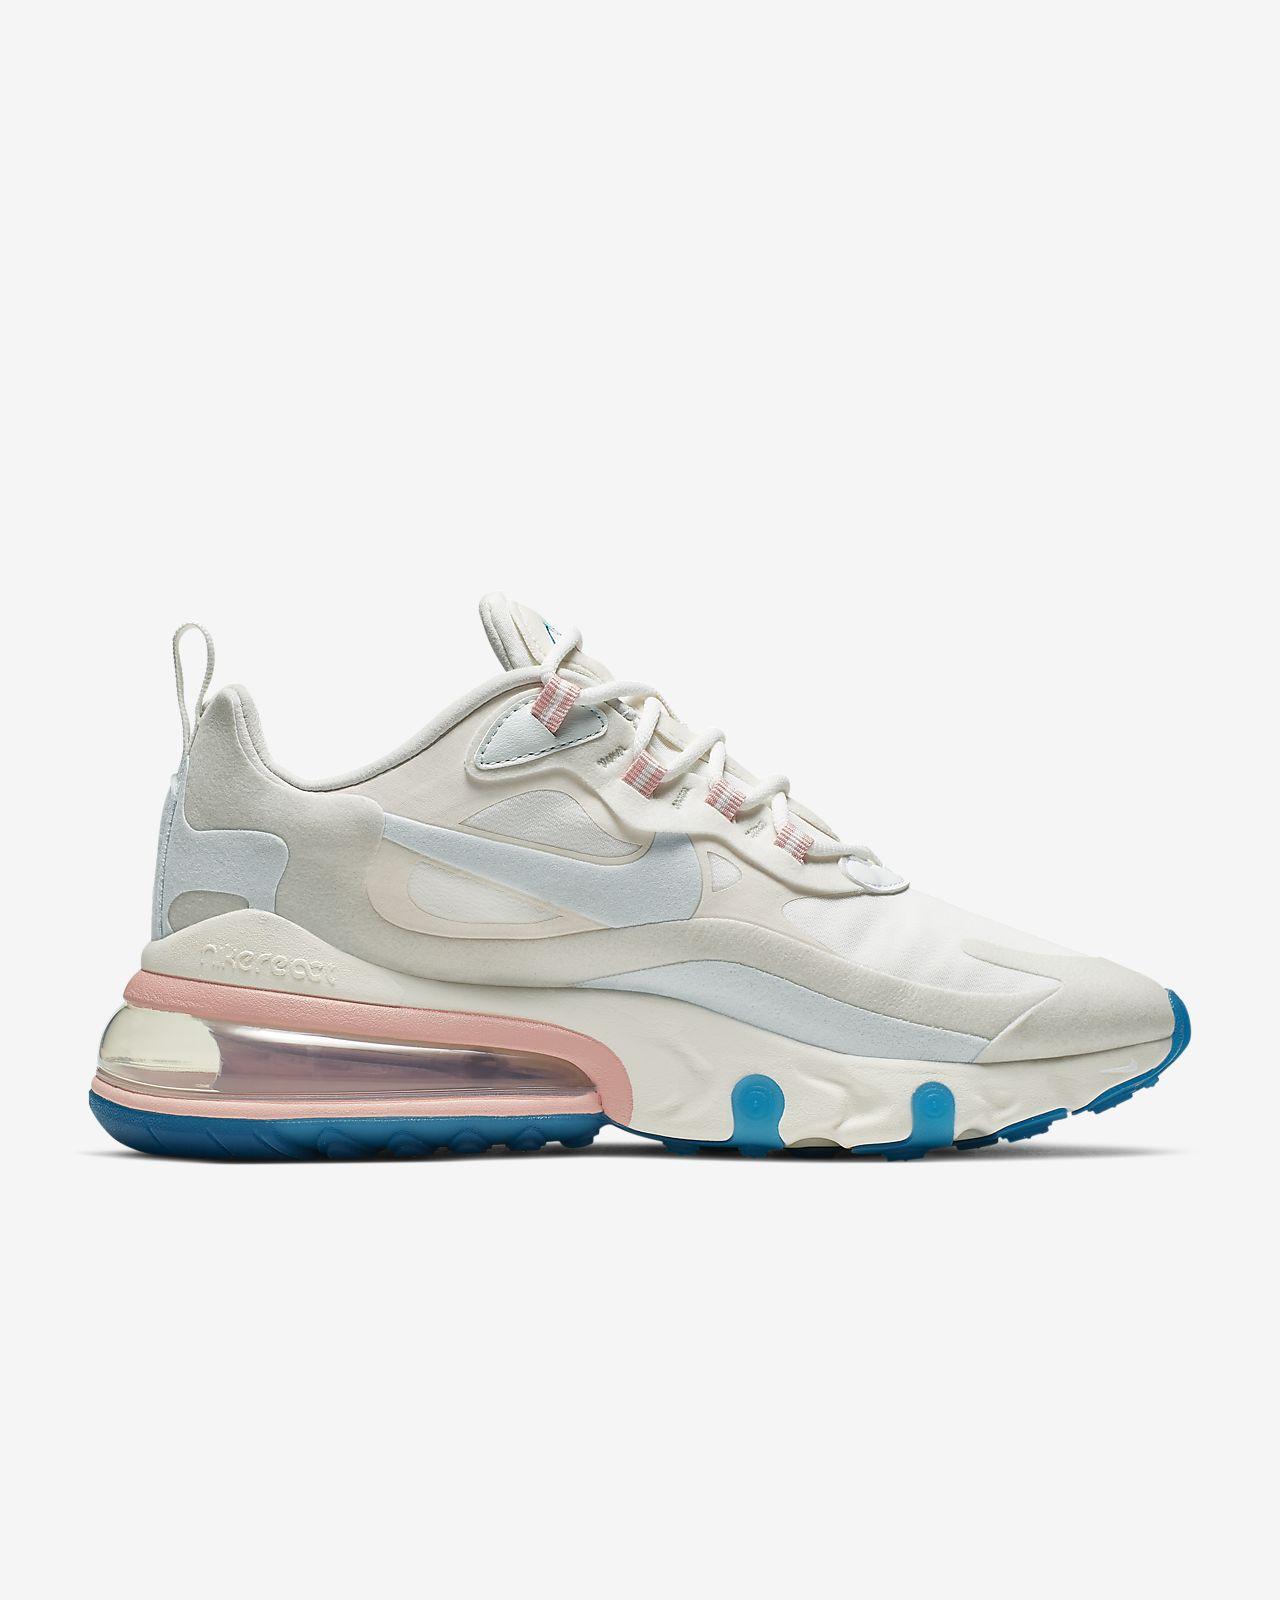 Nike Air Max 270 React (American Modern) Women's Shoe